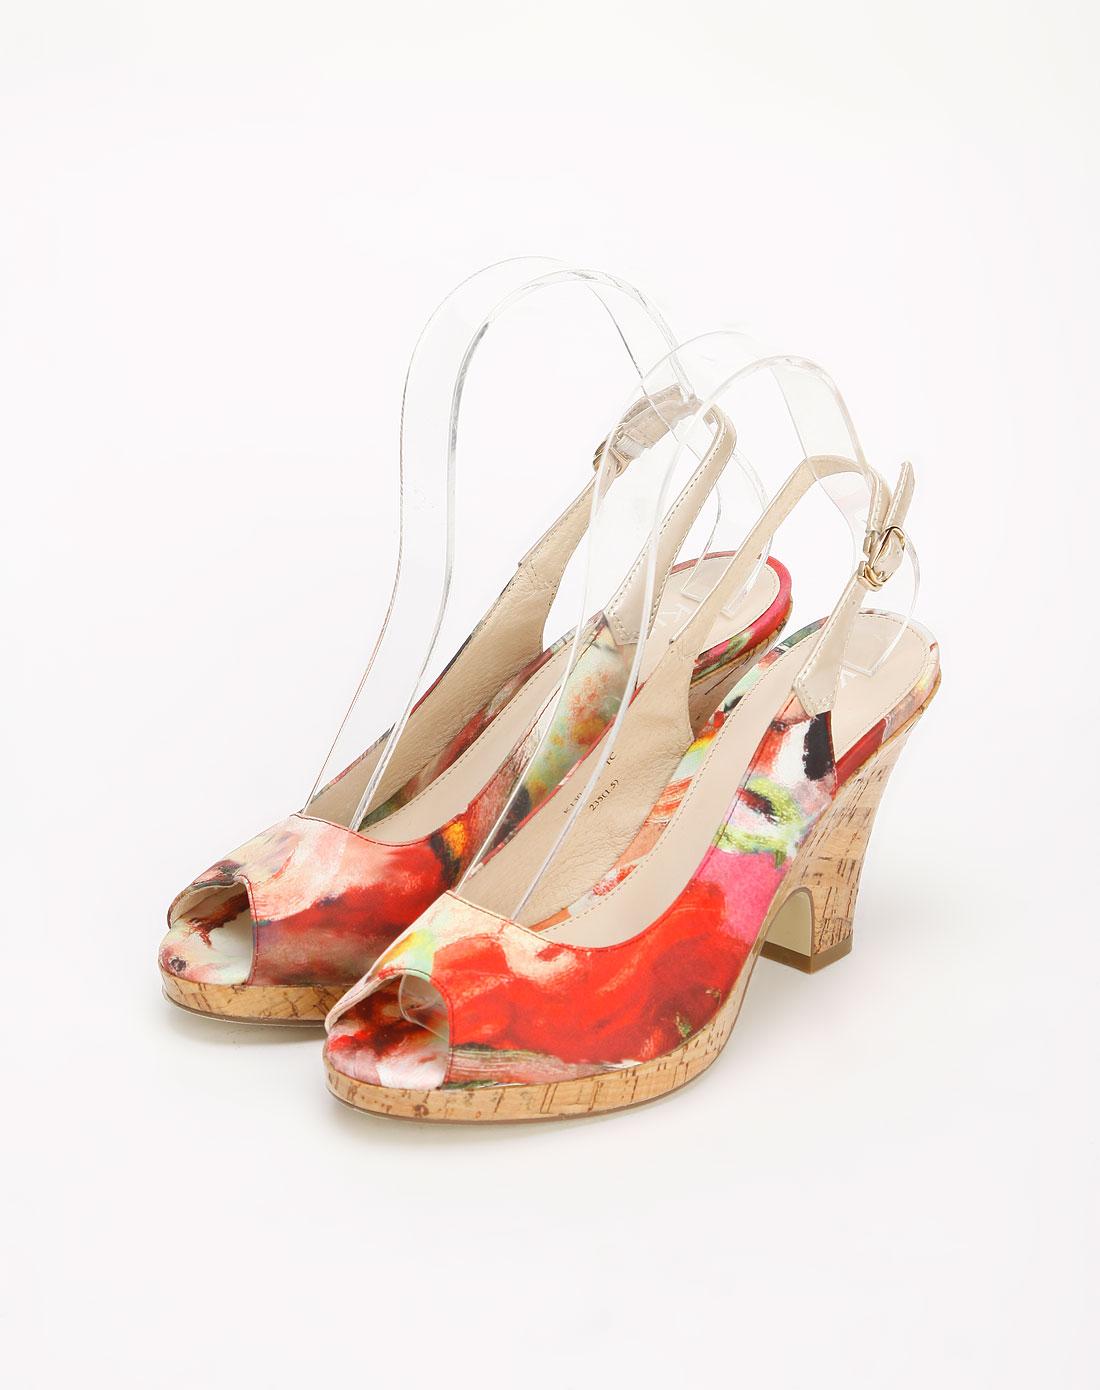 kisscat红/彩色鱼嘴凉鞋k130-10k101be-深红/浅粉杏图片